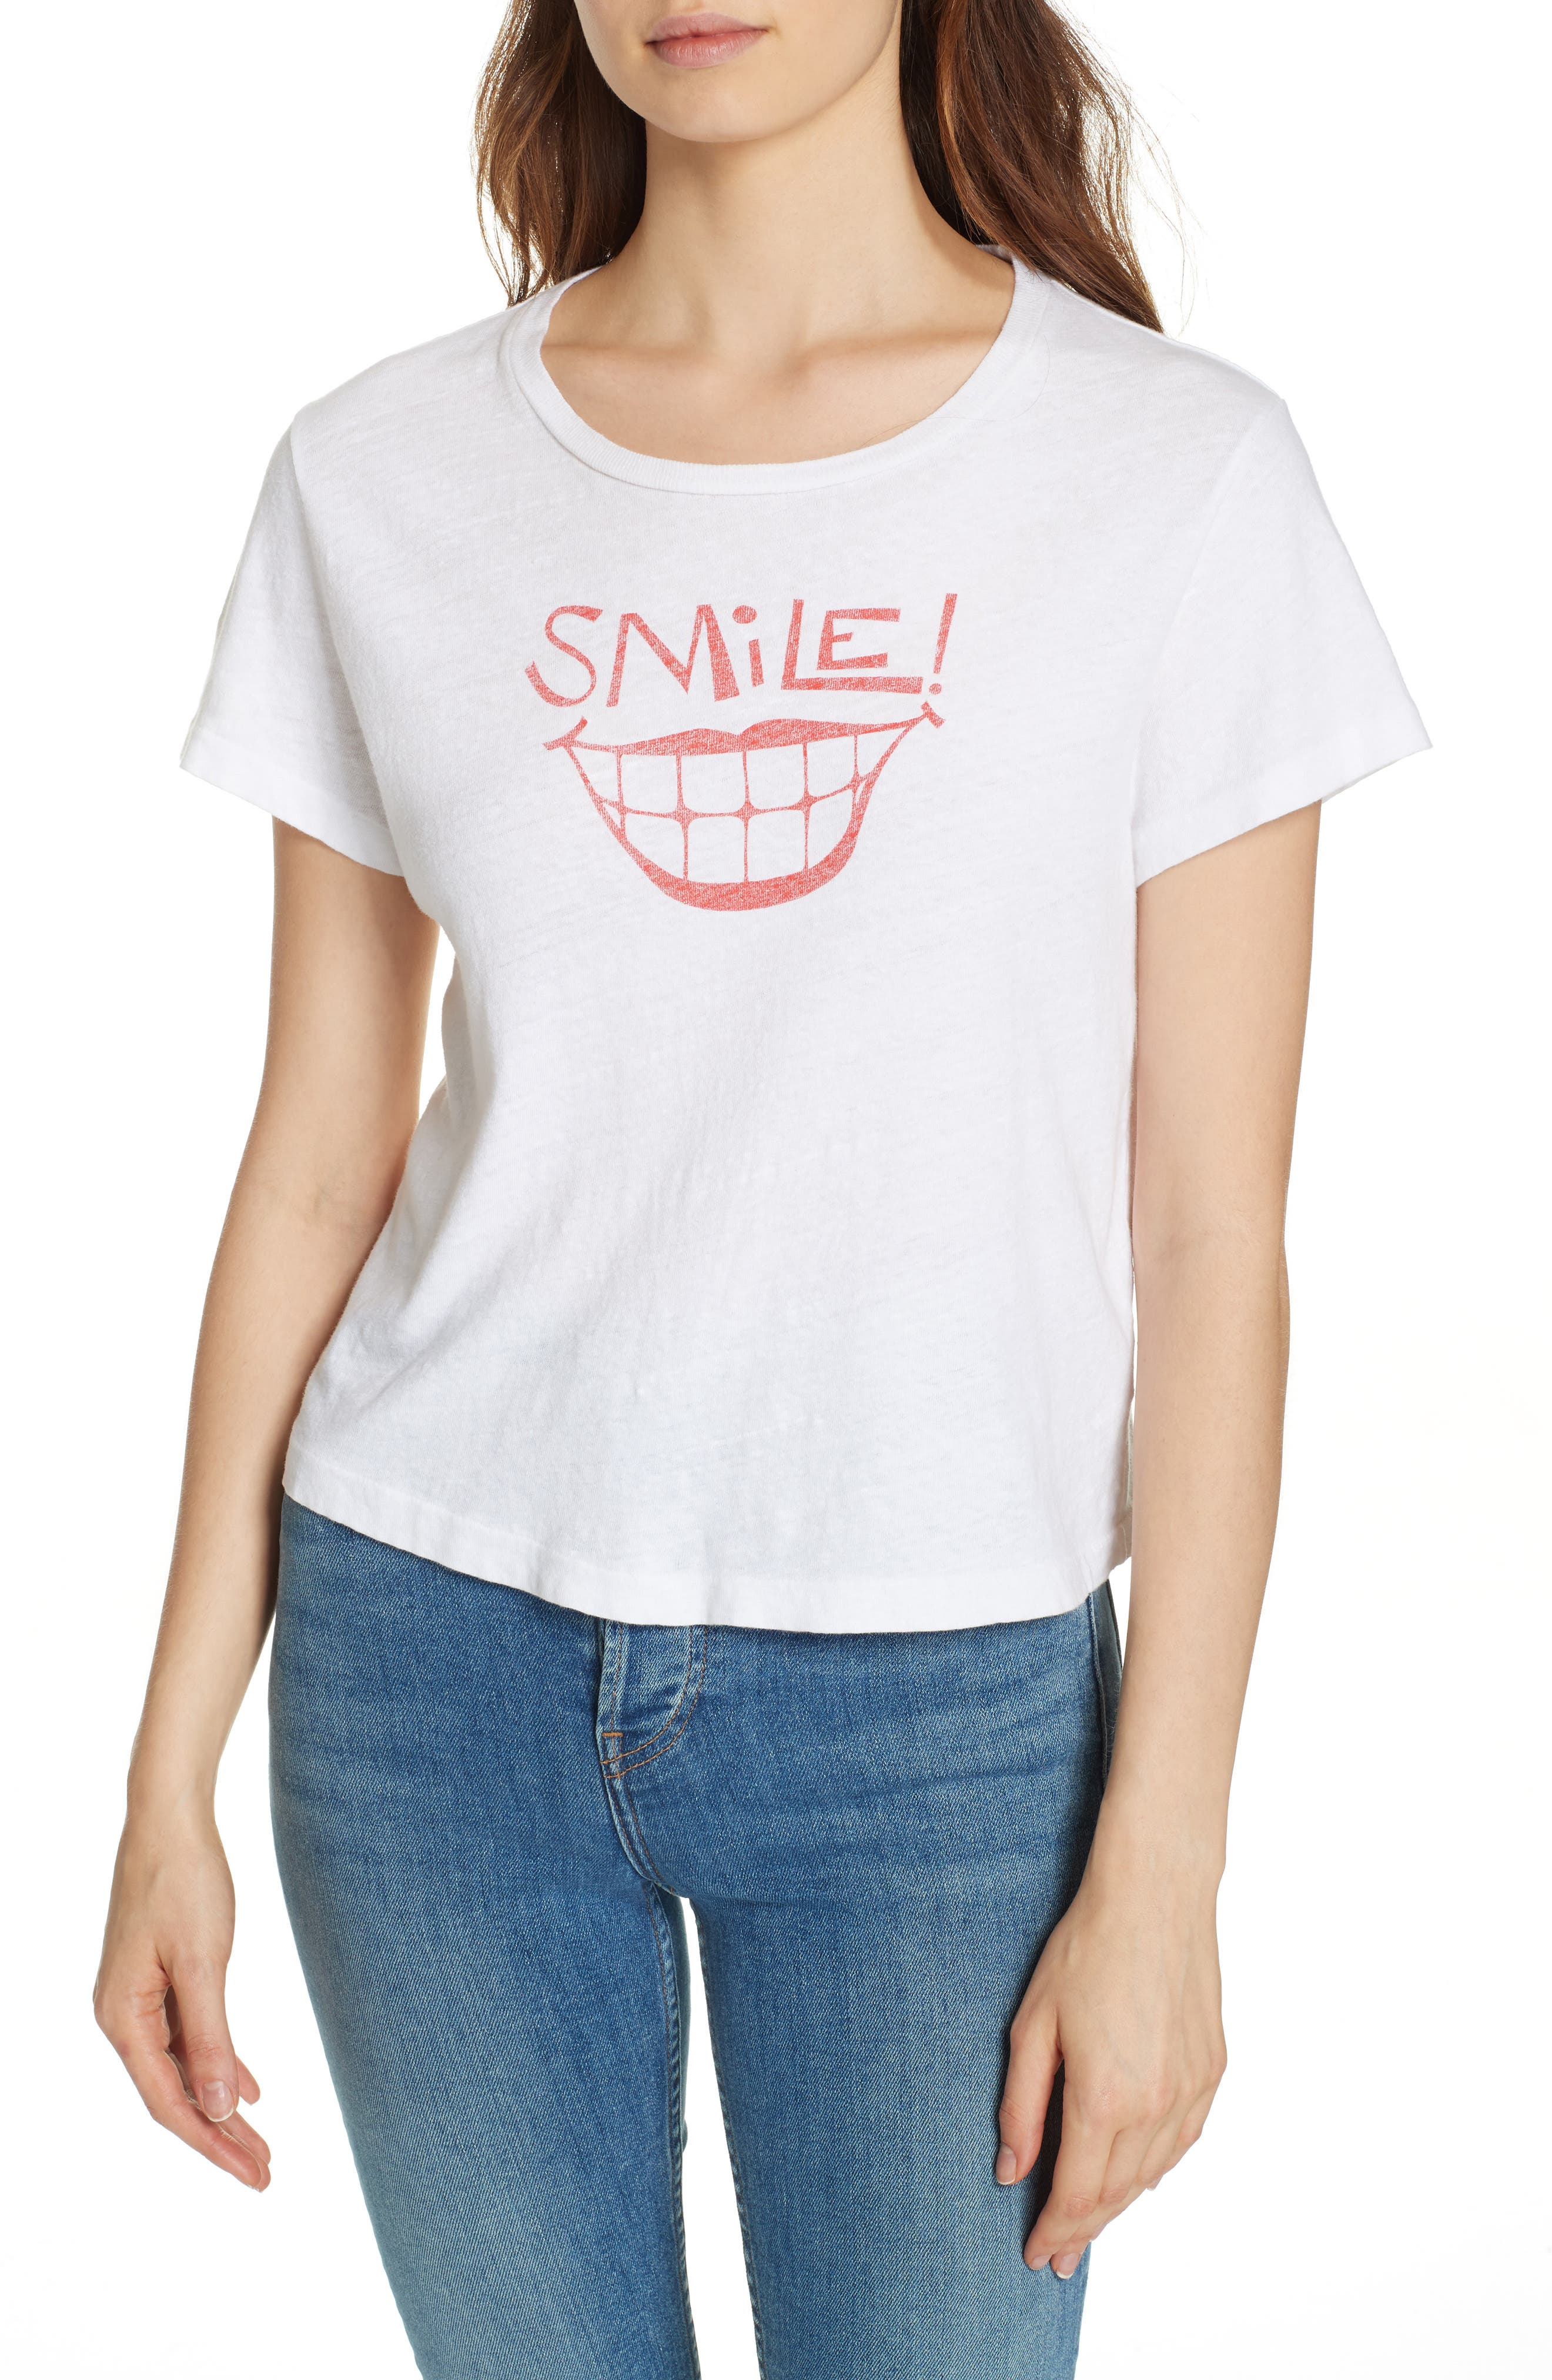 Smile Graphic Tee,                             Main thumbnail 1, color,                             OPTIC WHITE